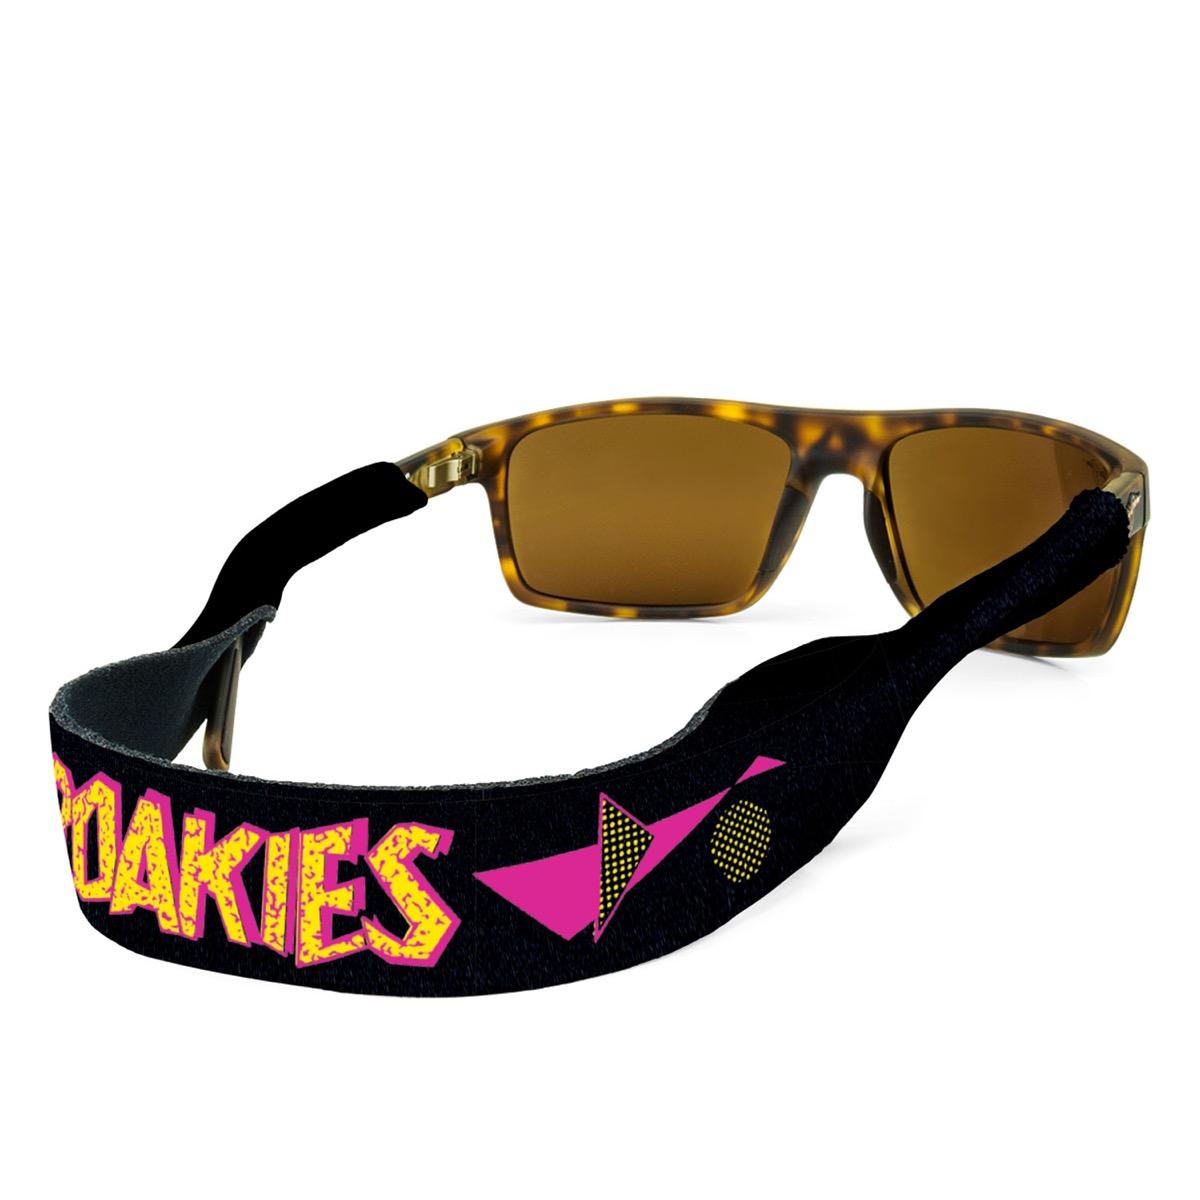 Croakies sunglass holders 1980s fashion